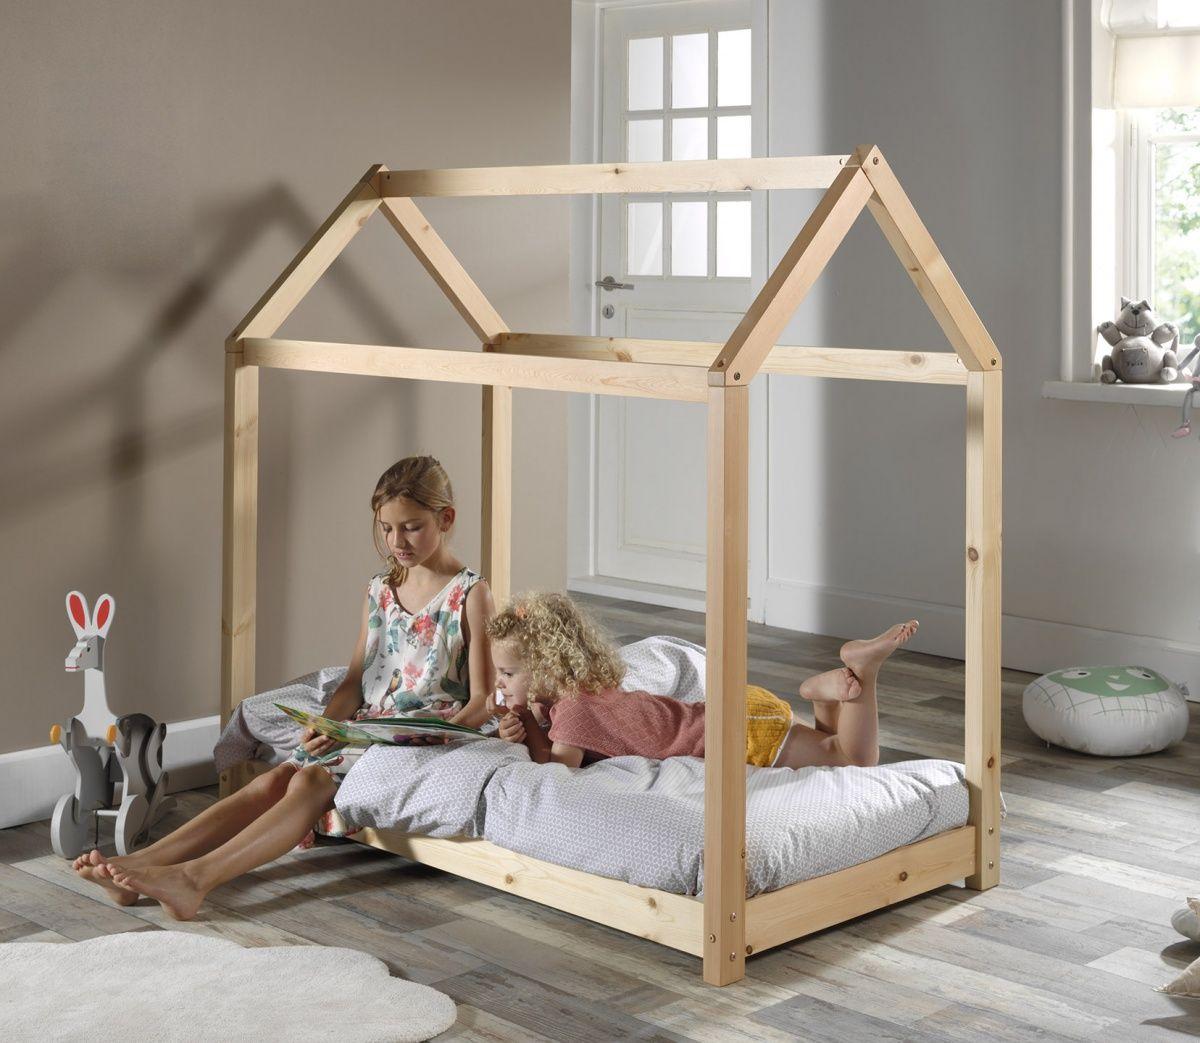 Lit Enfant House 70x140 Nordic Factory En 2020 Lit Cabane Lit Enfant Lits Cabine